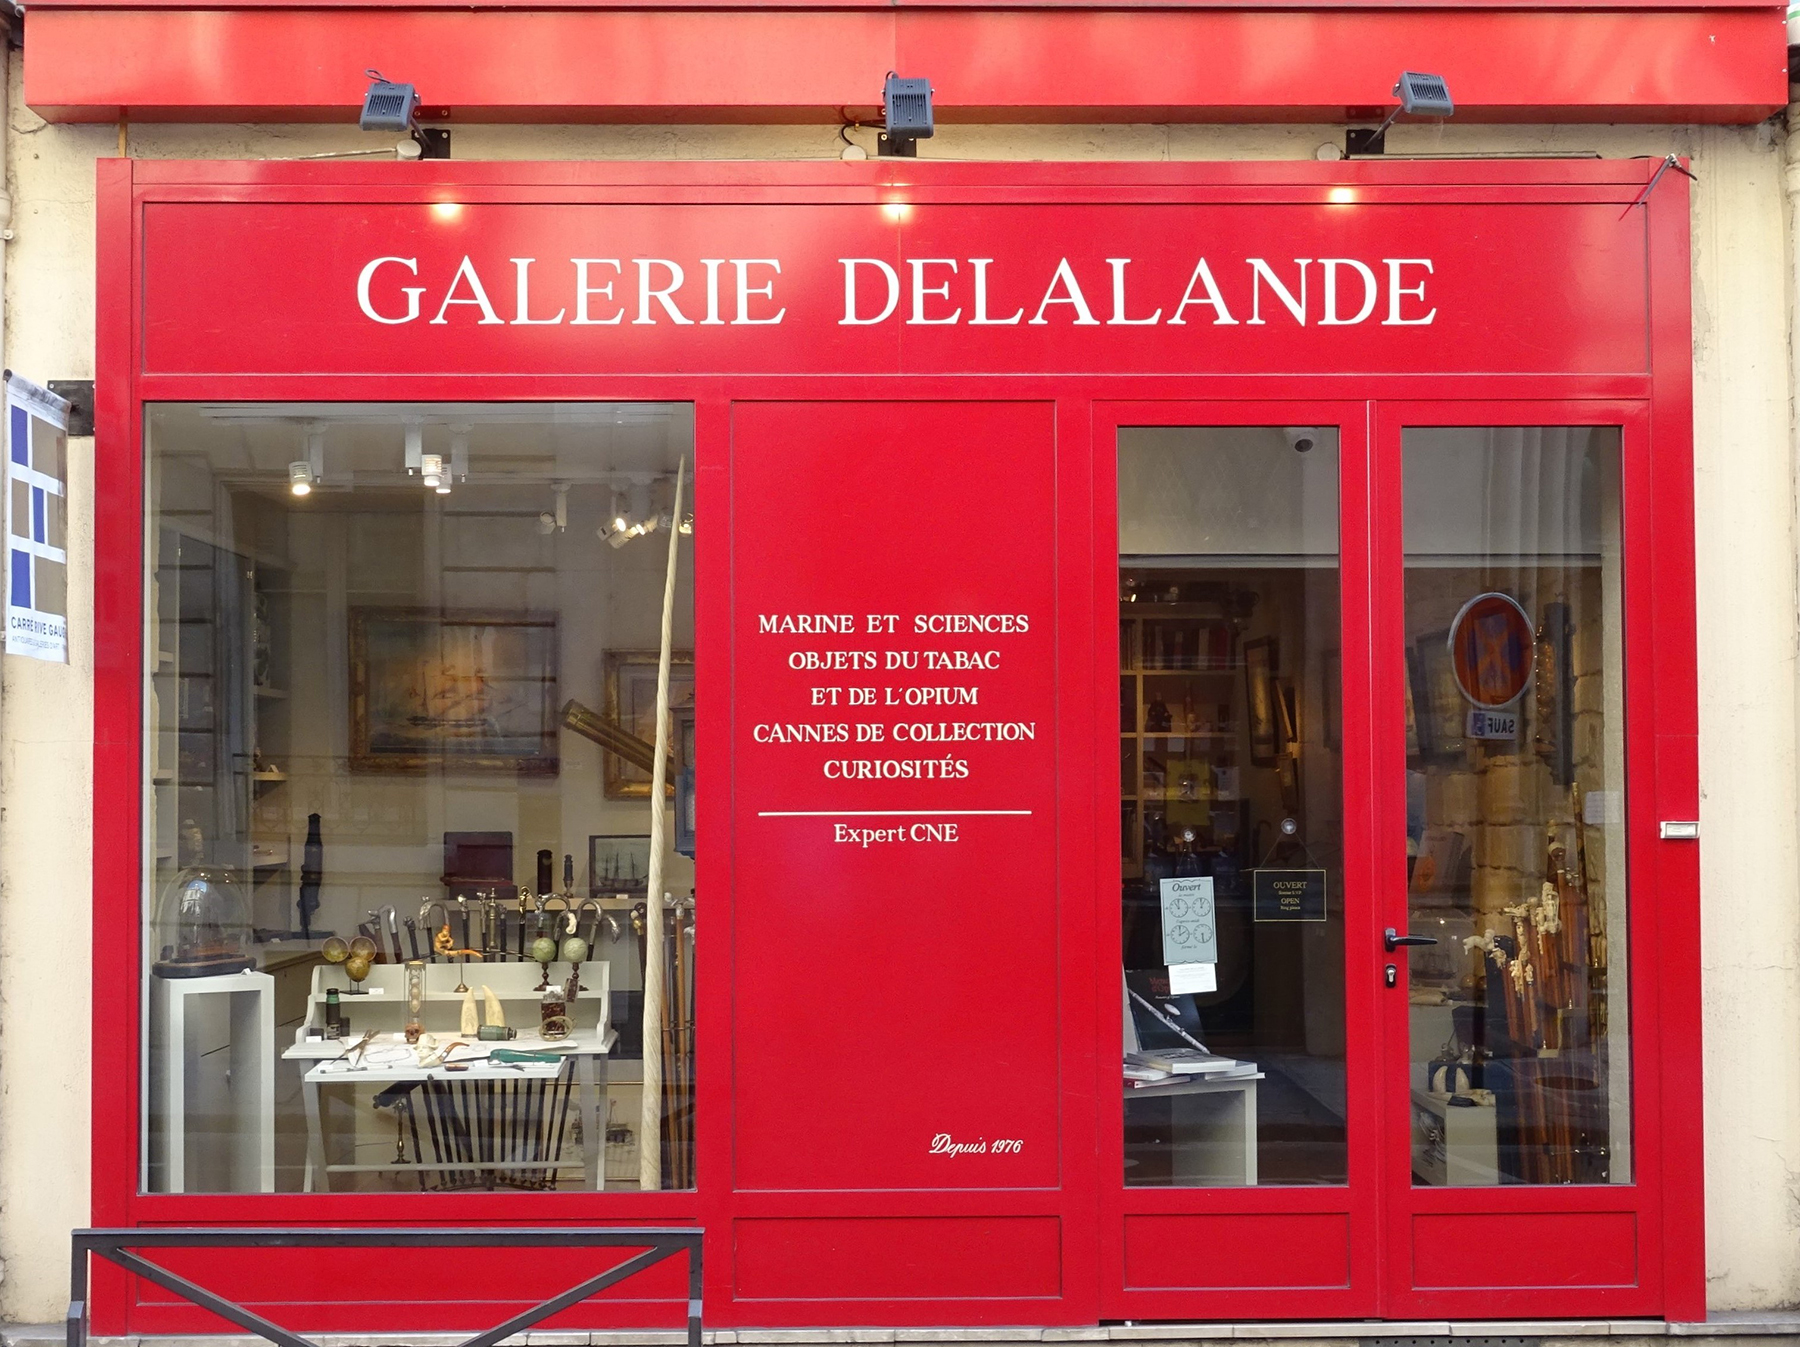 Galerie Delalande